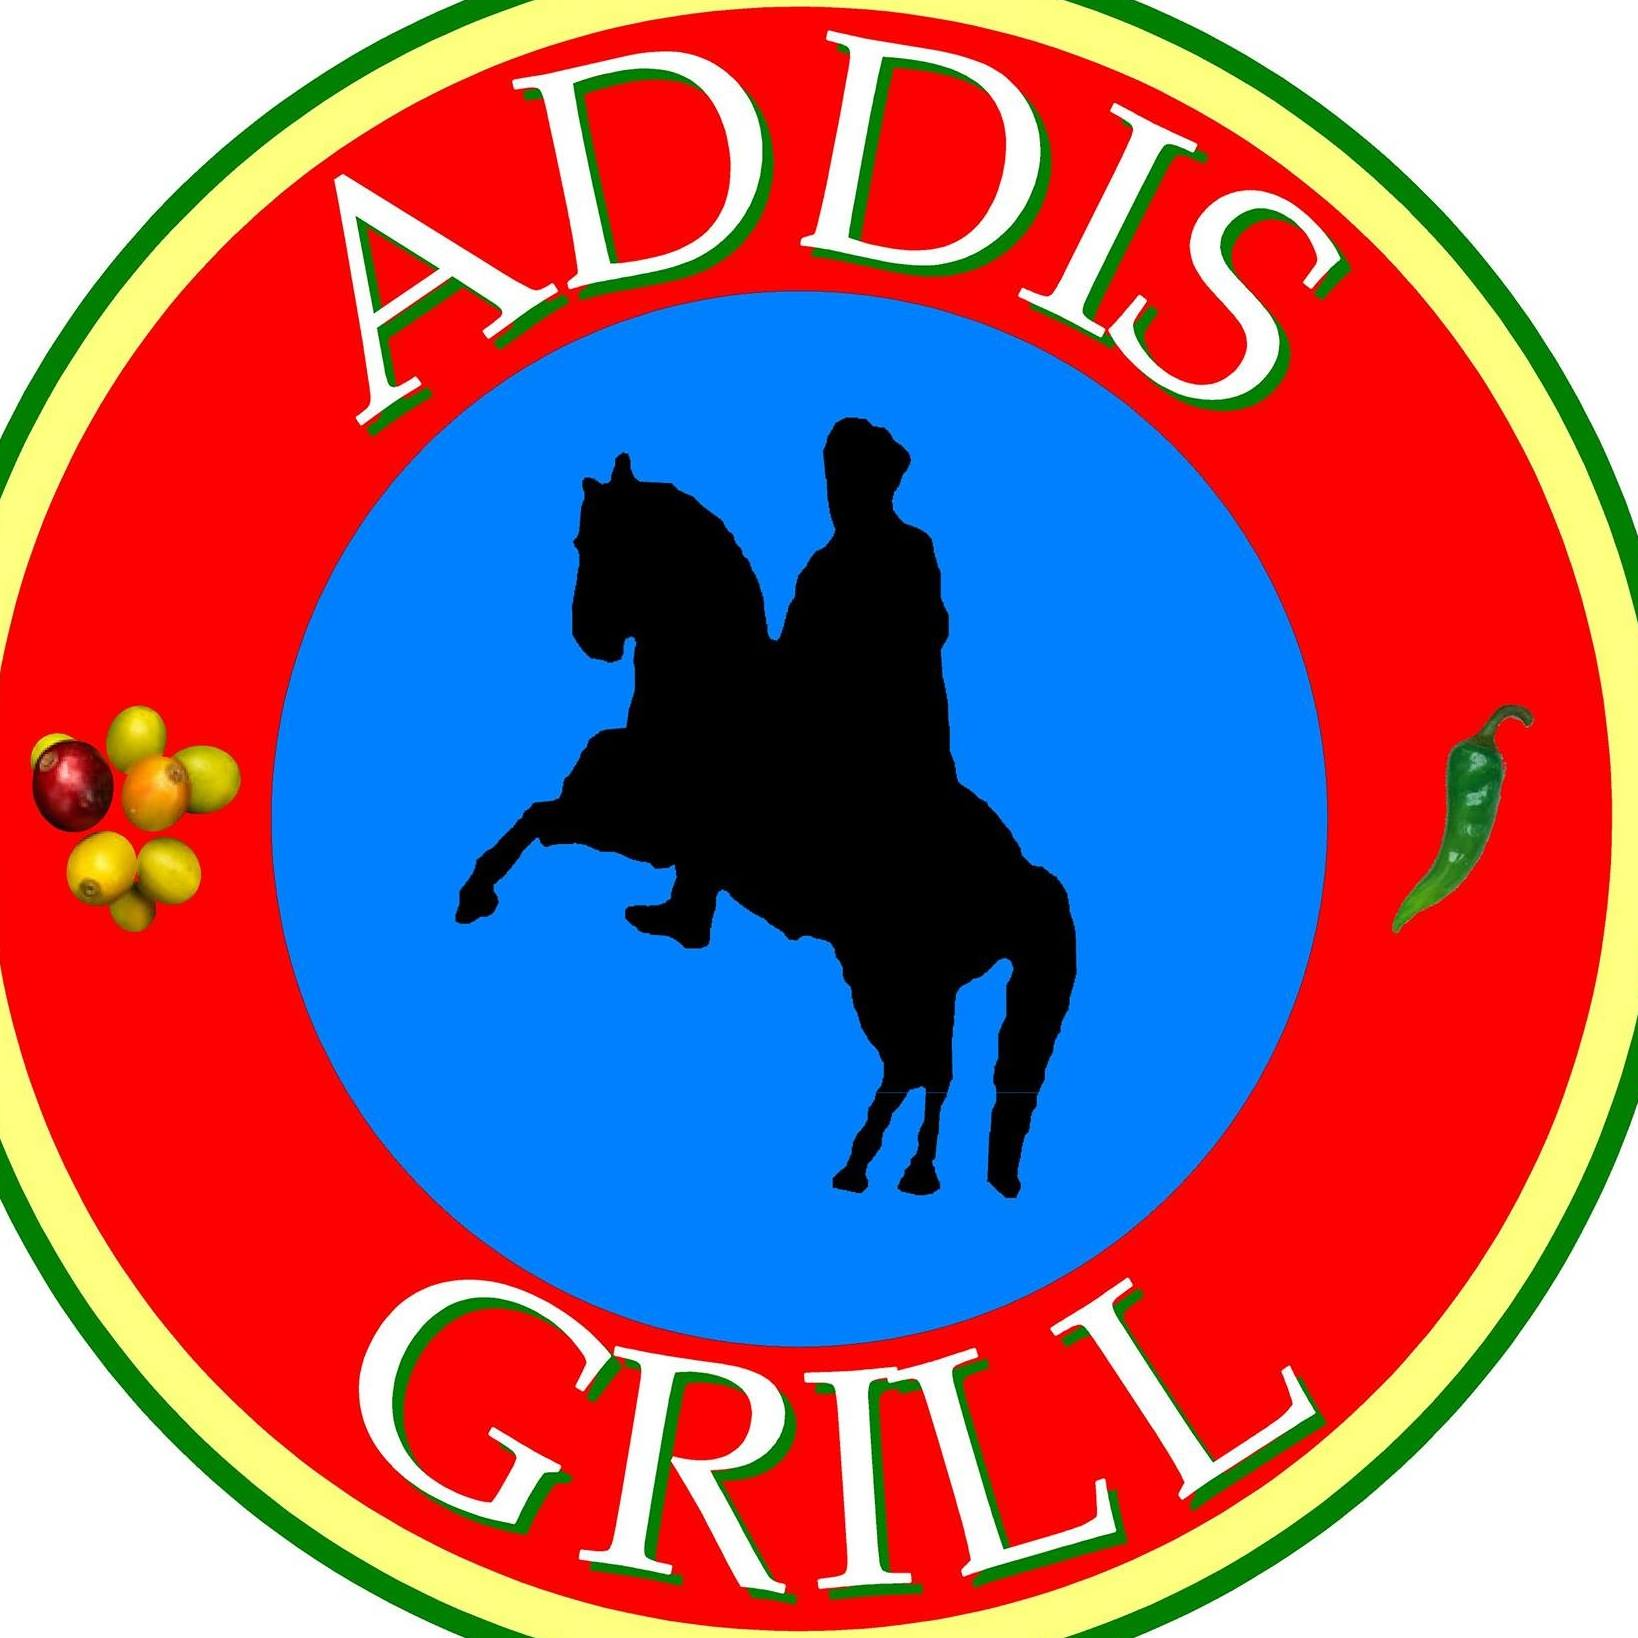 Addis Cafe